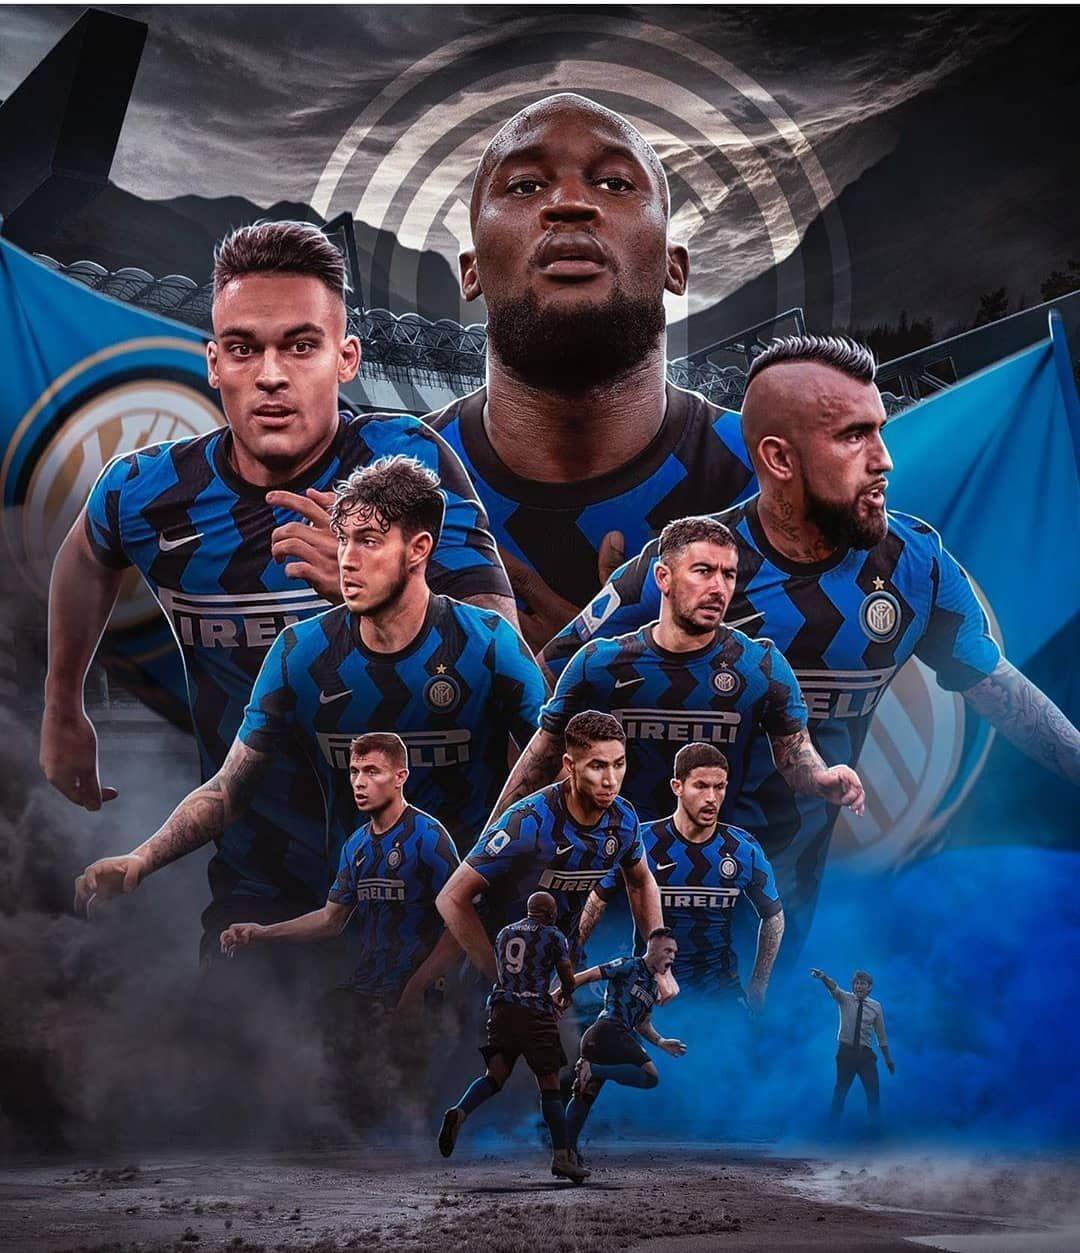 Jogo Bonito On Instagram Podra El Inter Ganar La Serie A 20 21 Inter De Milao Estadio Futebol Inter Club